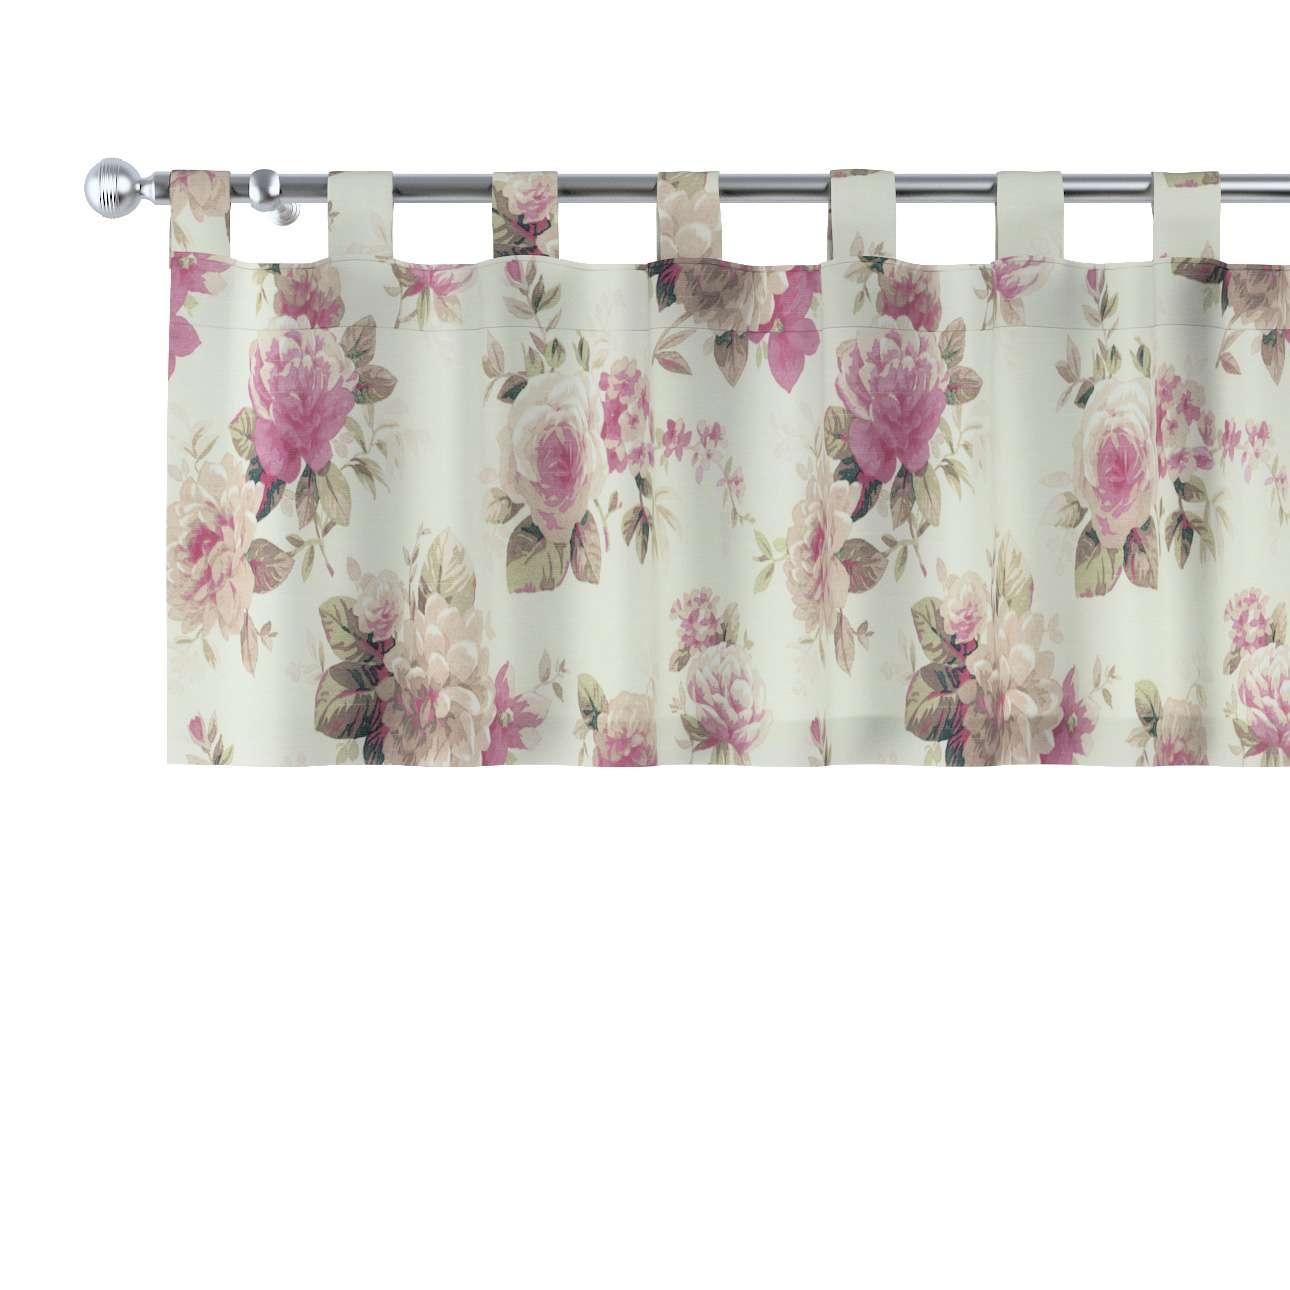 Lambrekin na szelkach 130x40cm w kolekcji Mirella, tkanina: 141-07